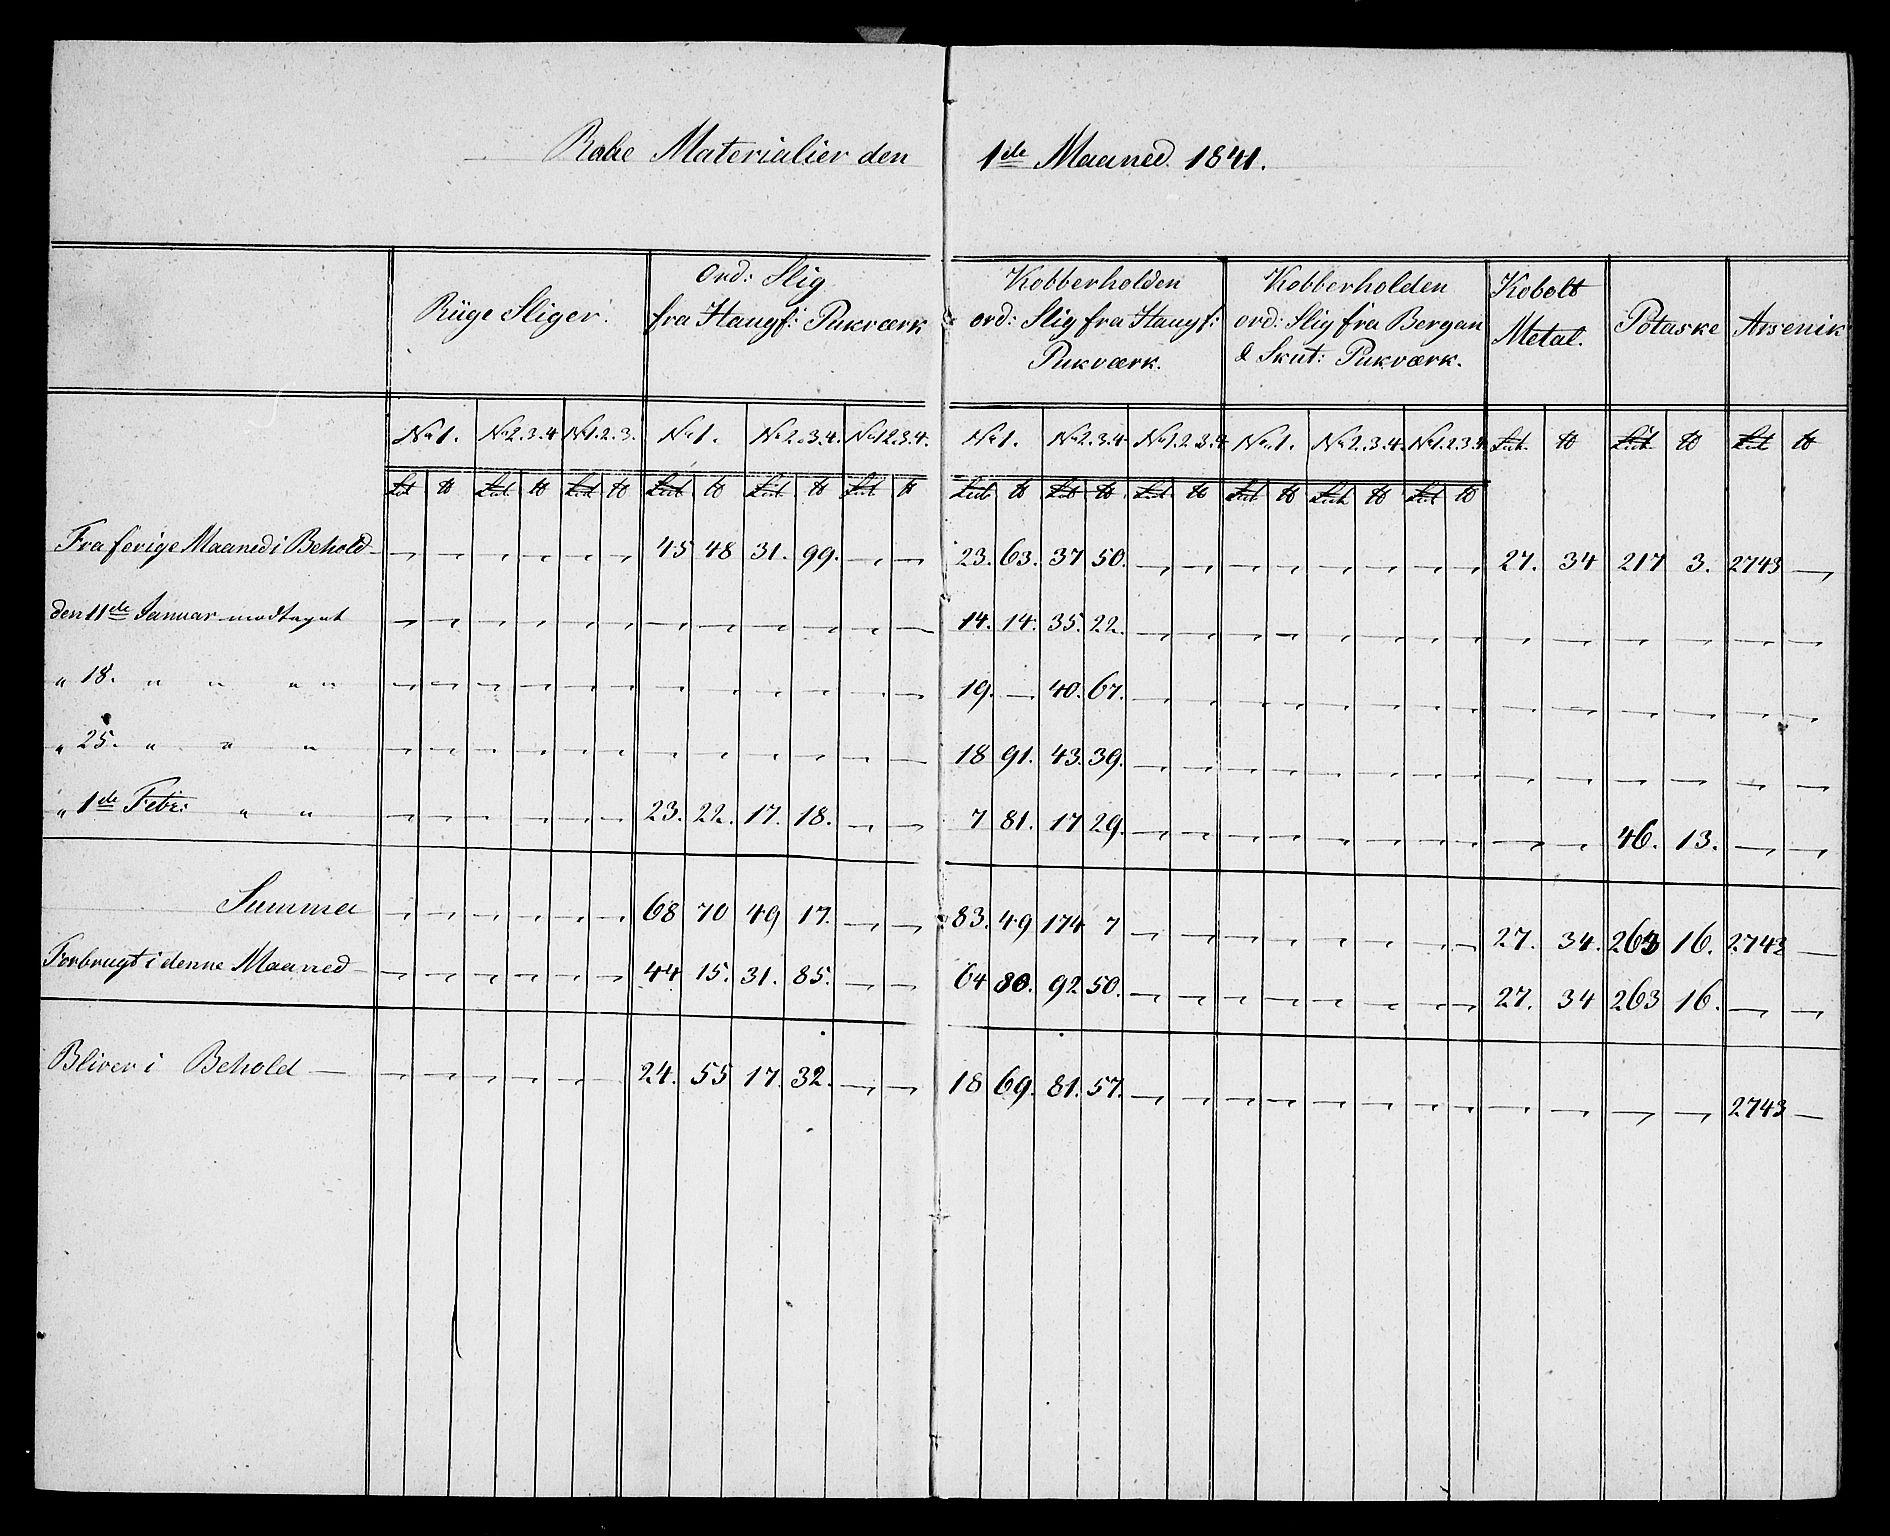 RA, Modums Blaafarveværk, G/Gd/Gdb/L0196: Materialbok, 1841-1849, s. 2